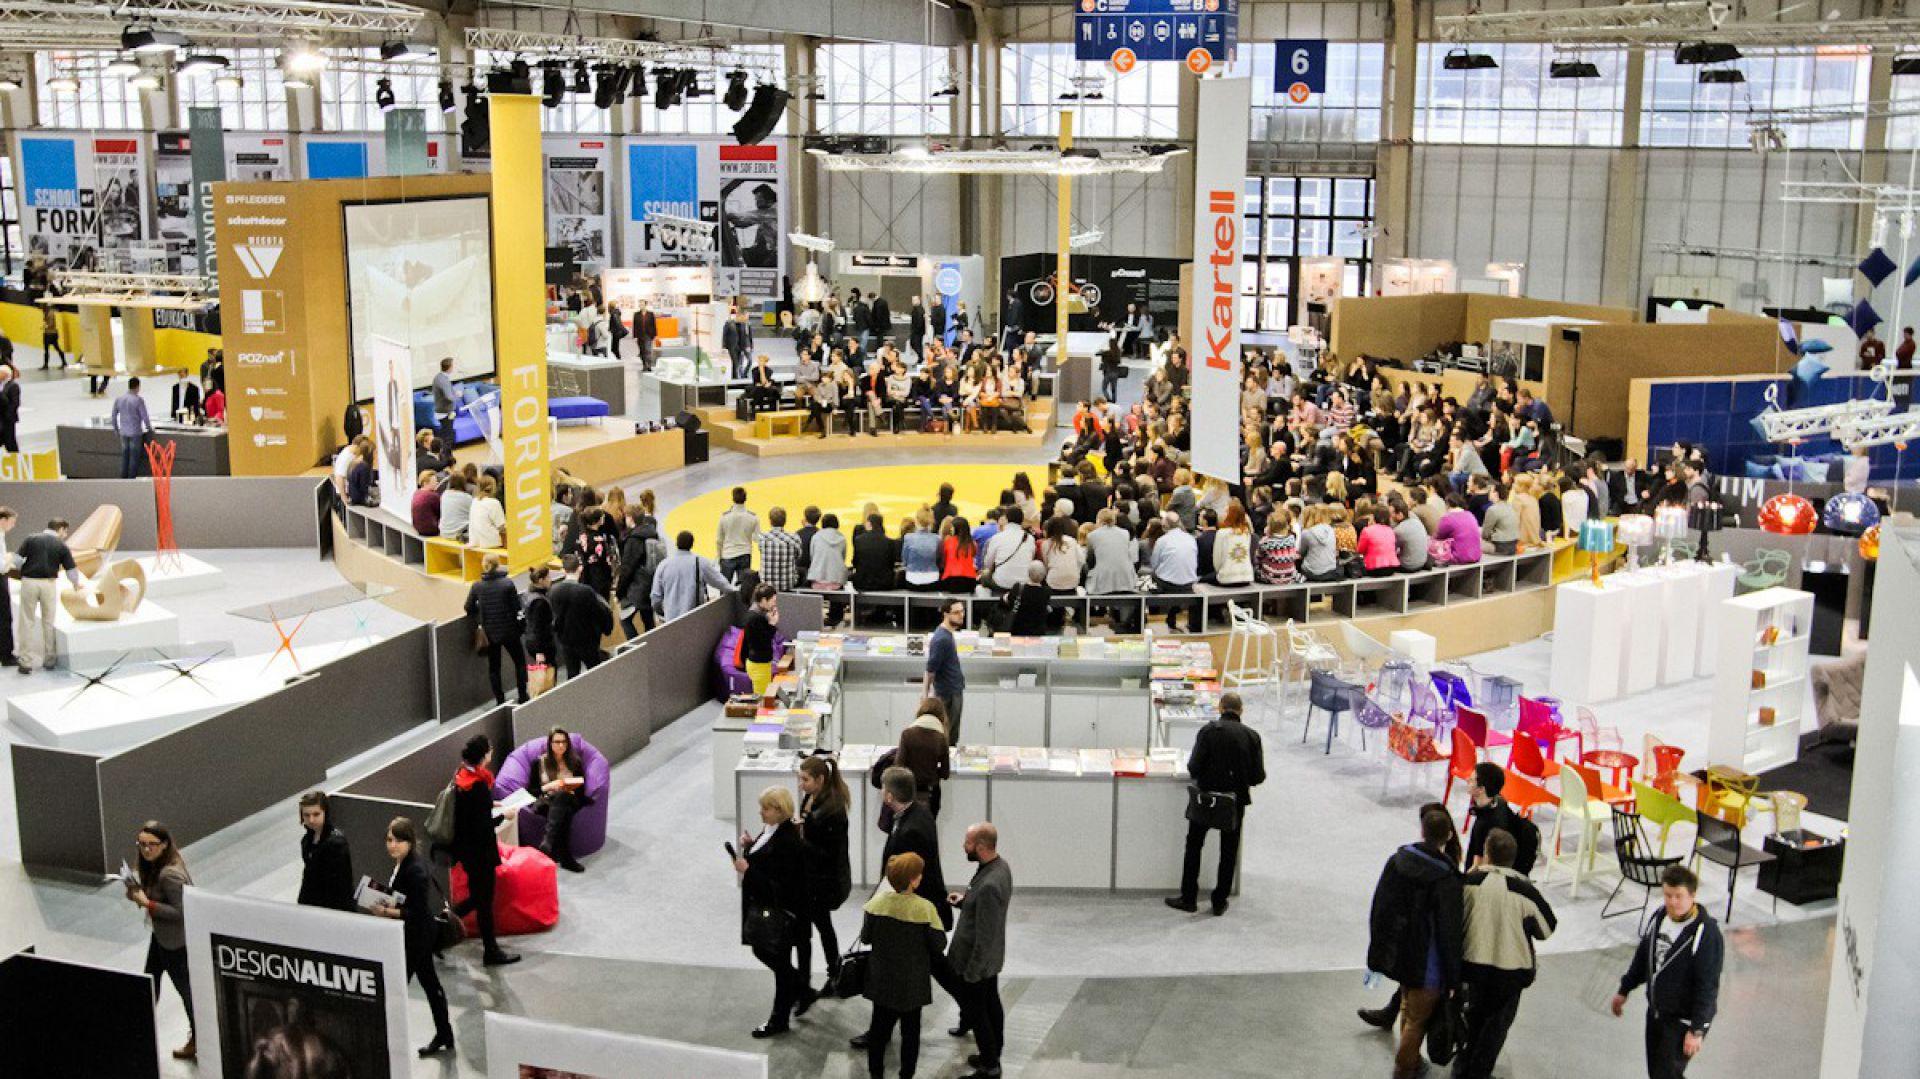 arena design 2014. Fot. materiały organizatora.